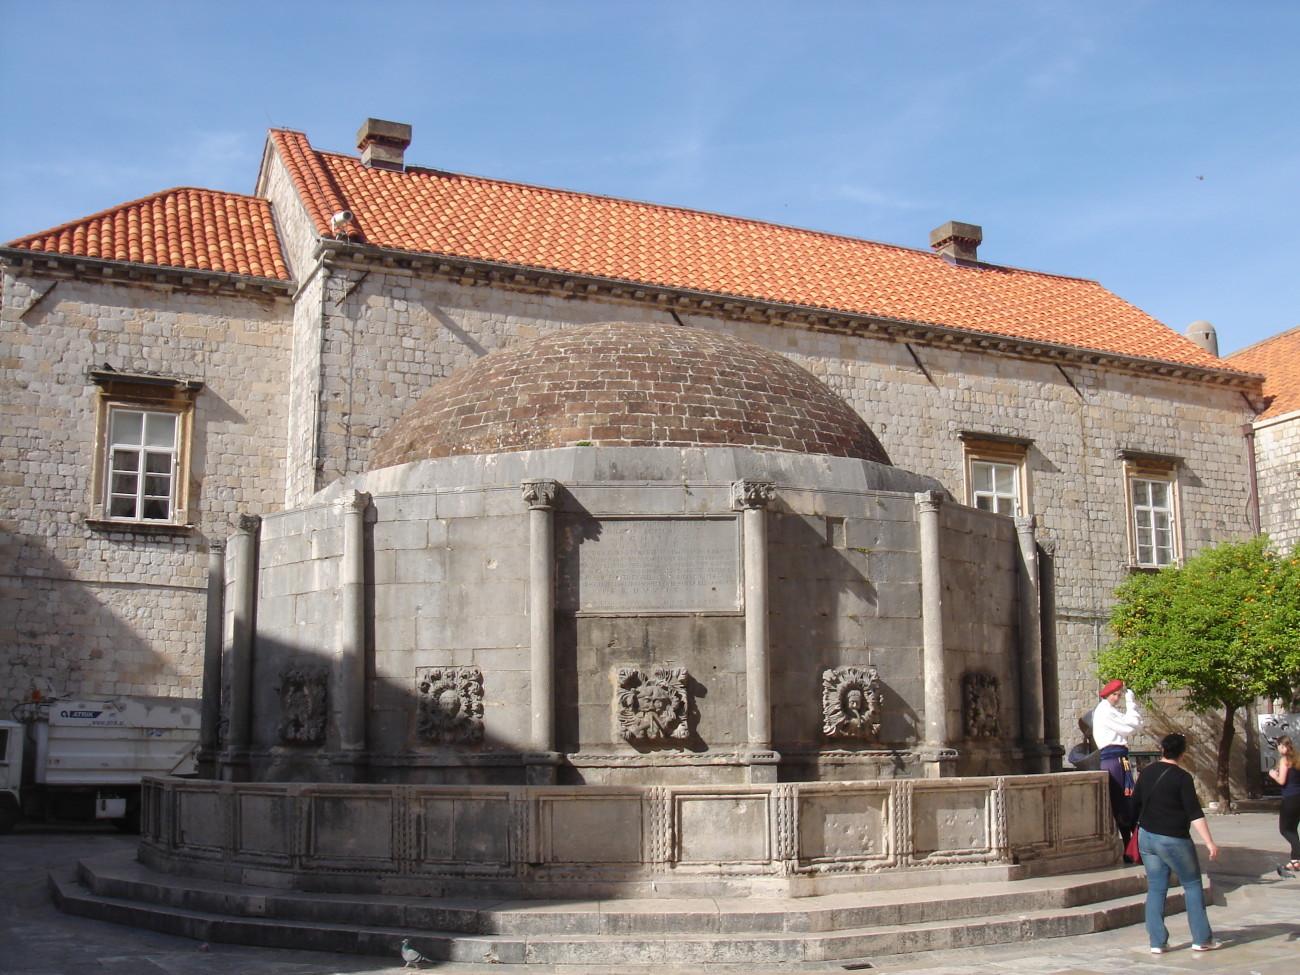 Fonte di Onofrio - Dubrovnik - Croacia - Vou pra Roma Blog